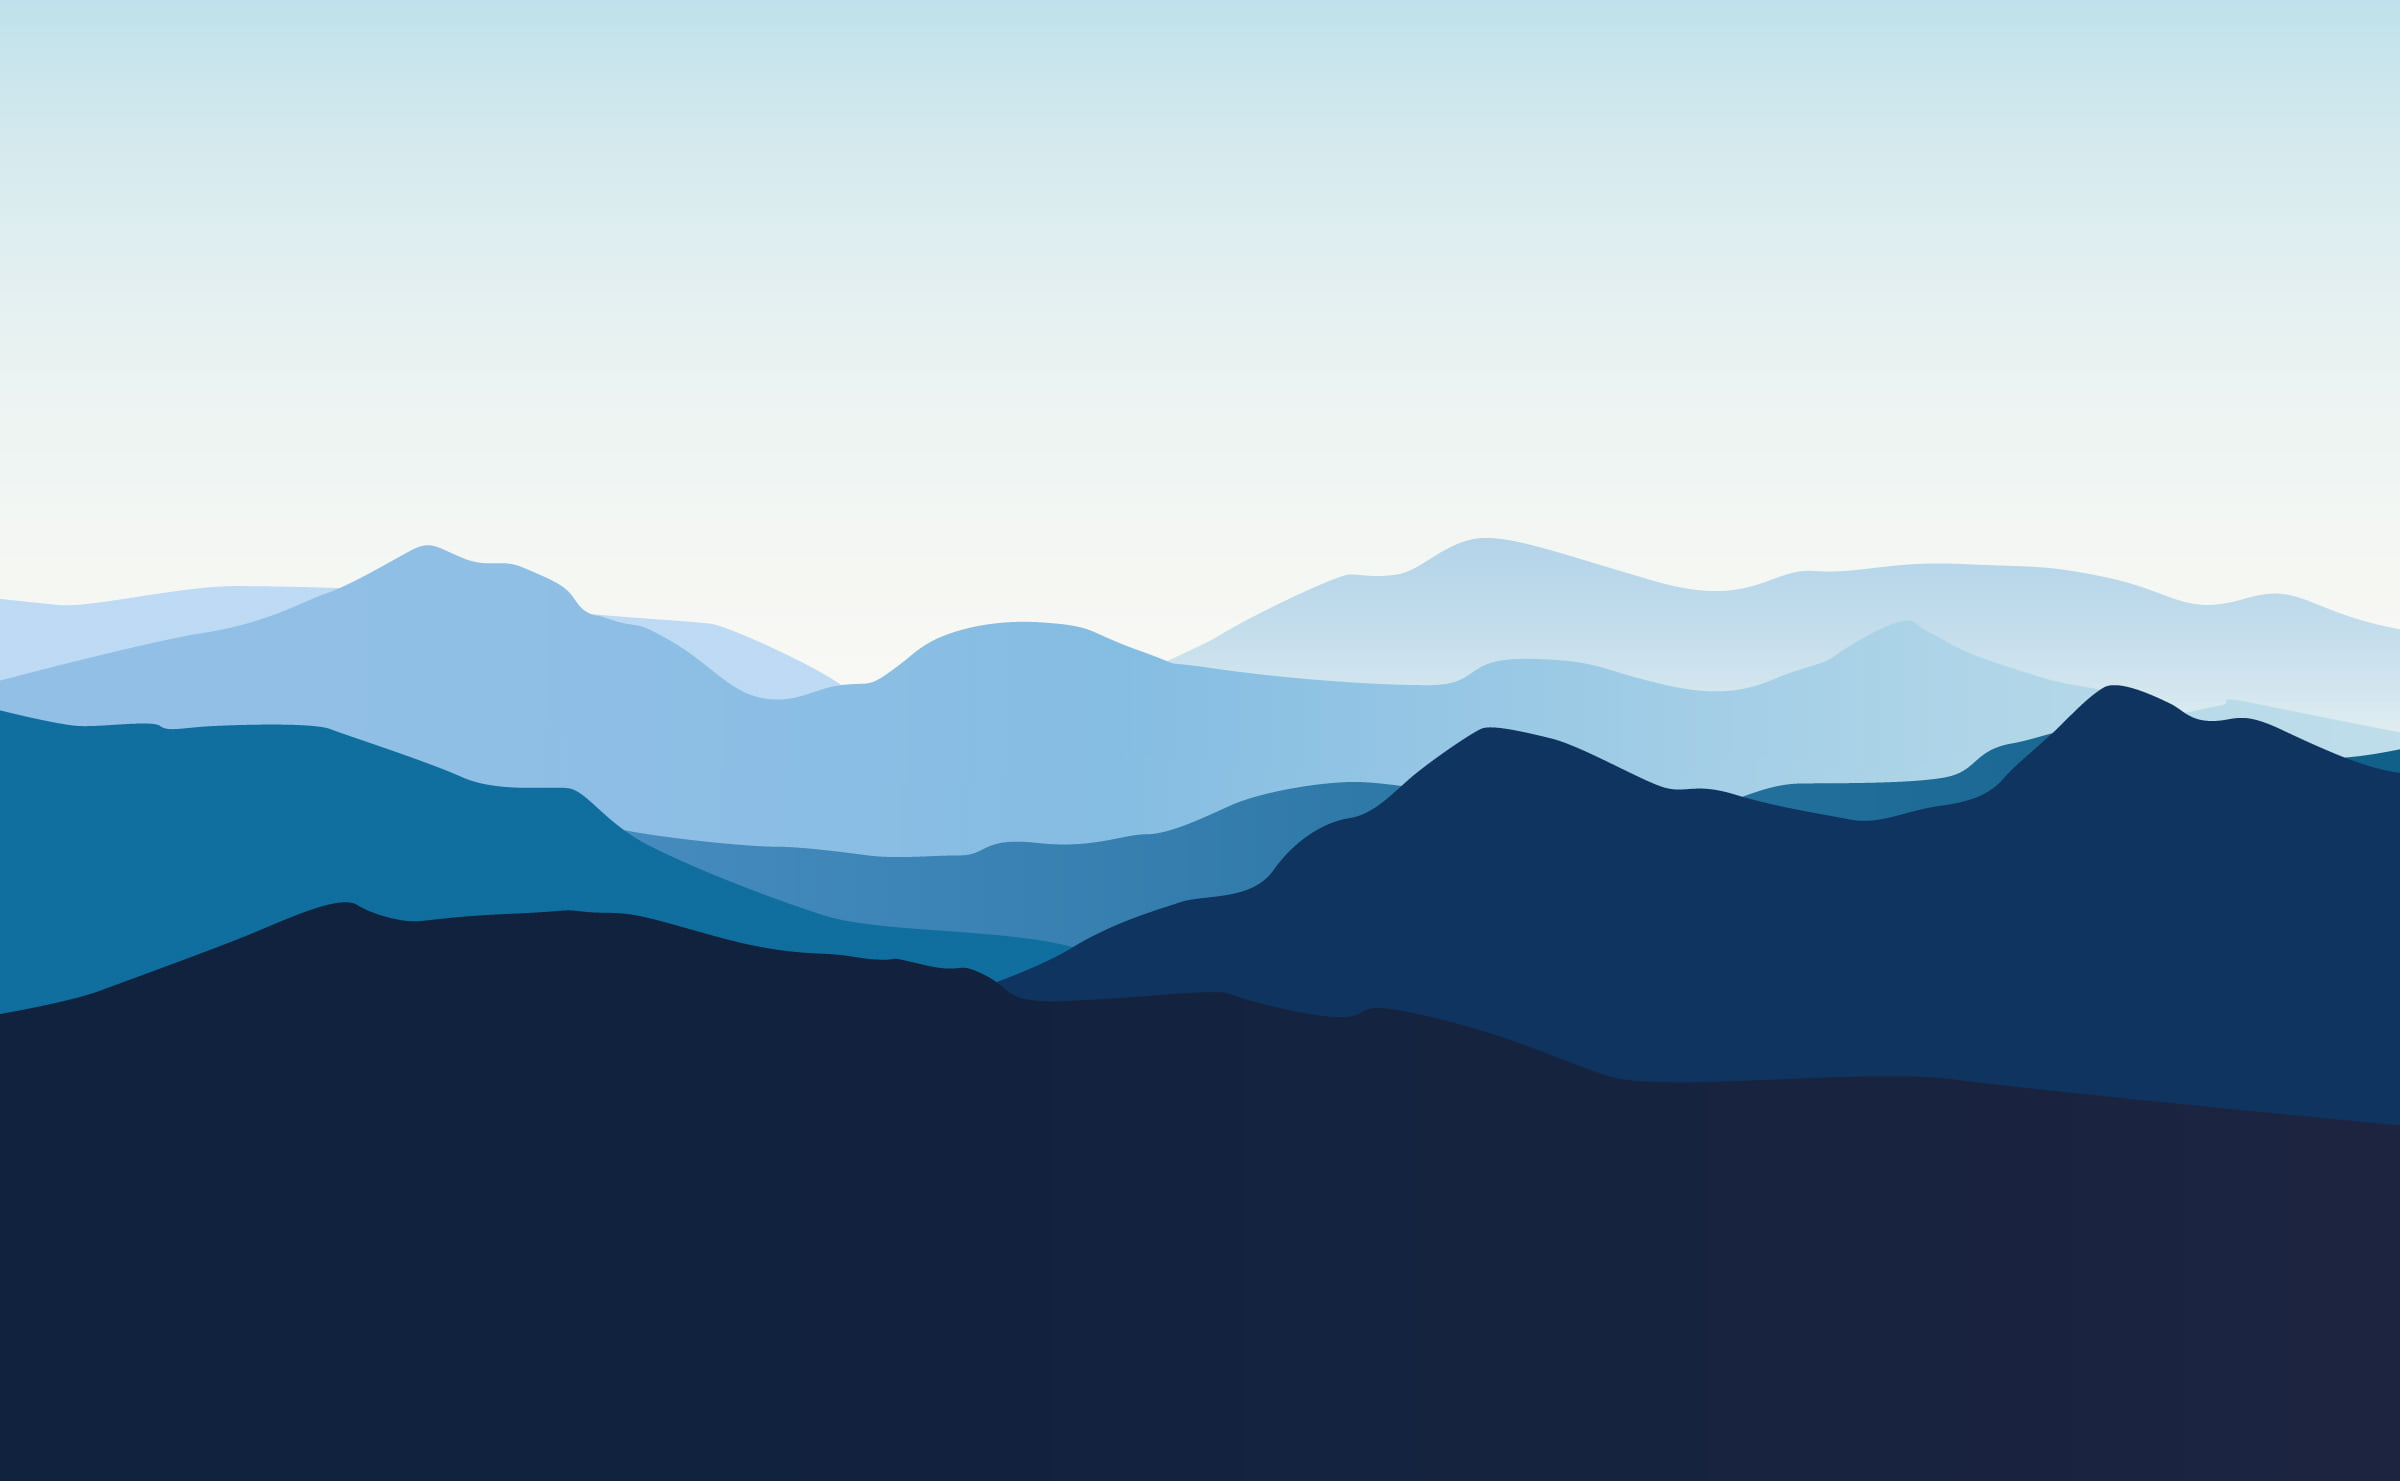 bergskedja illustration